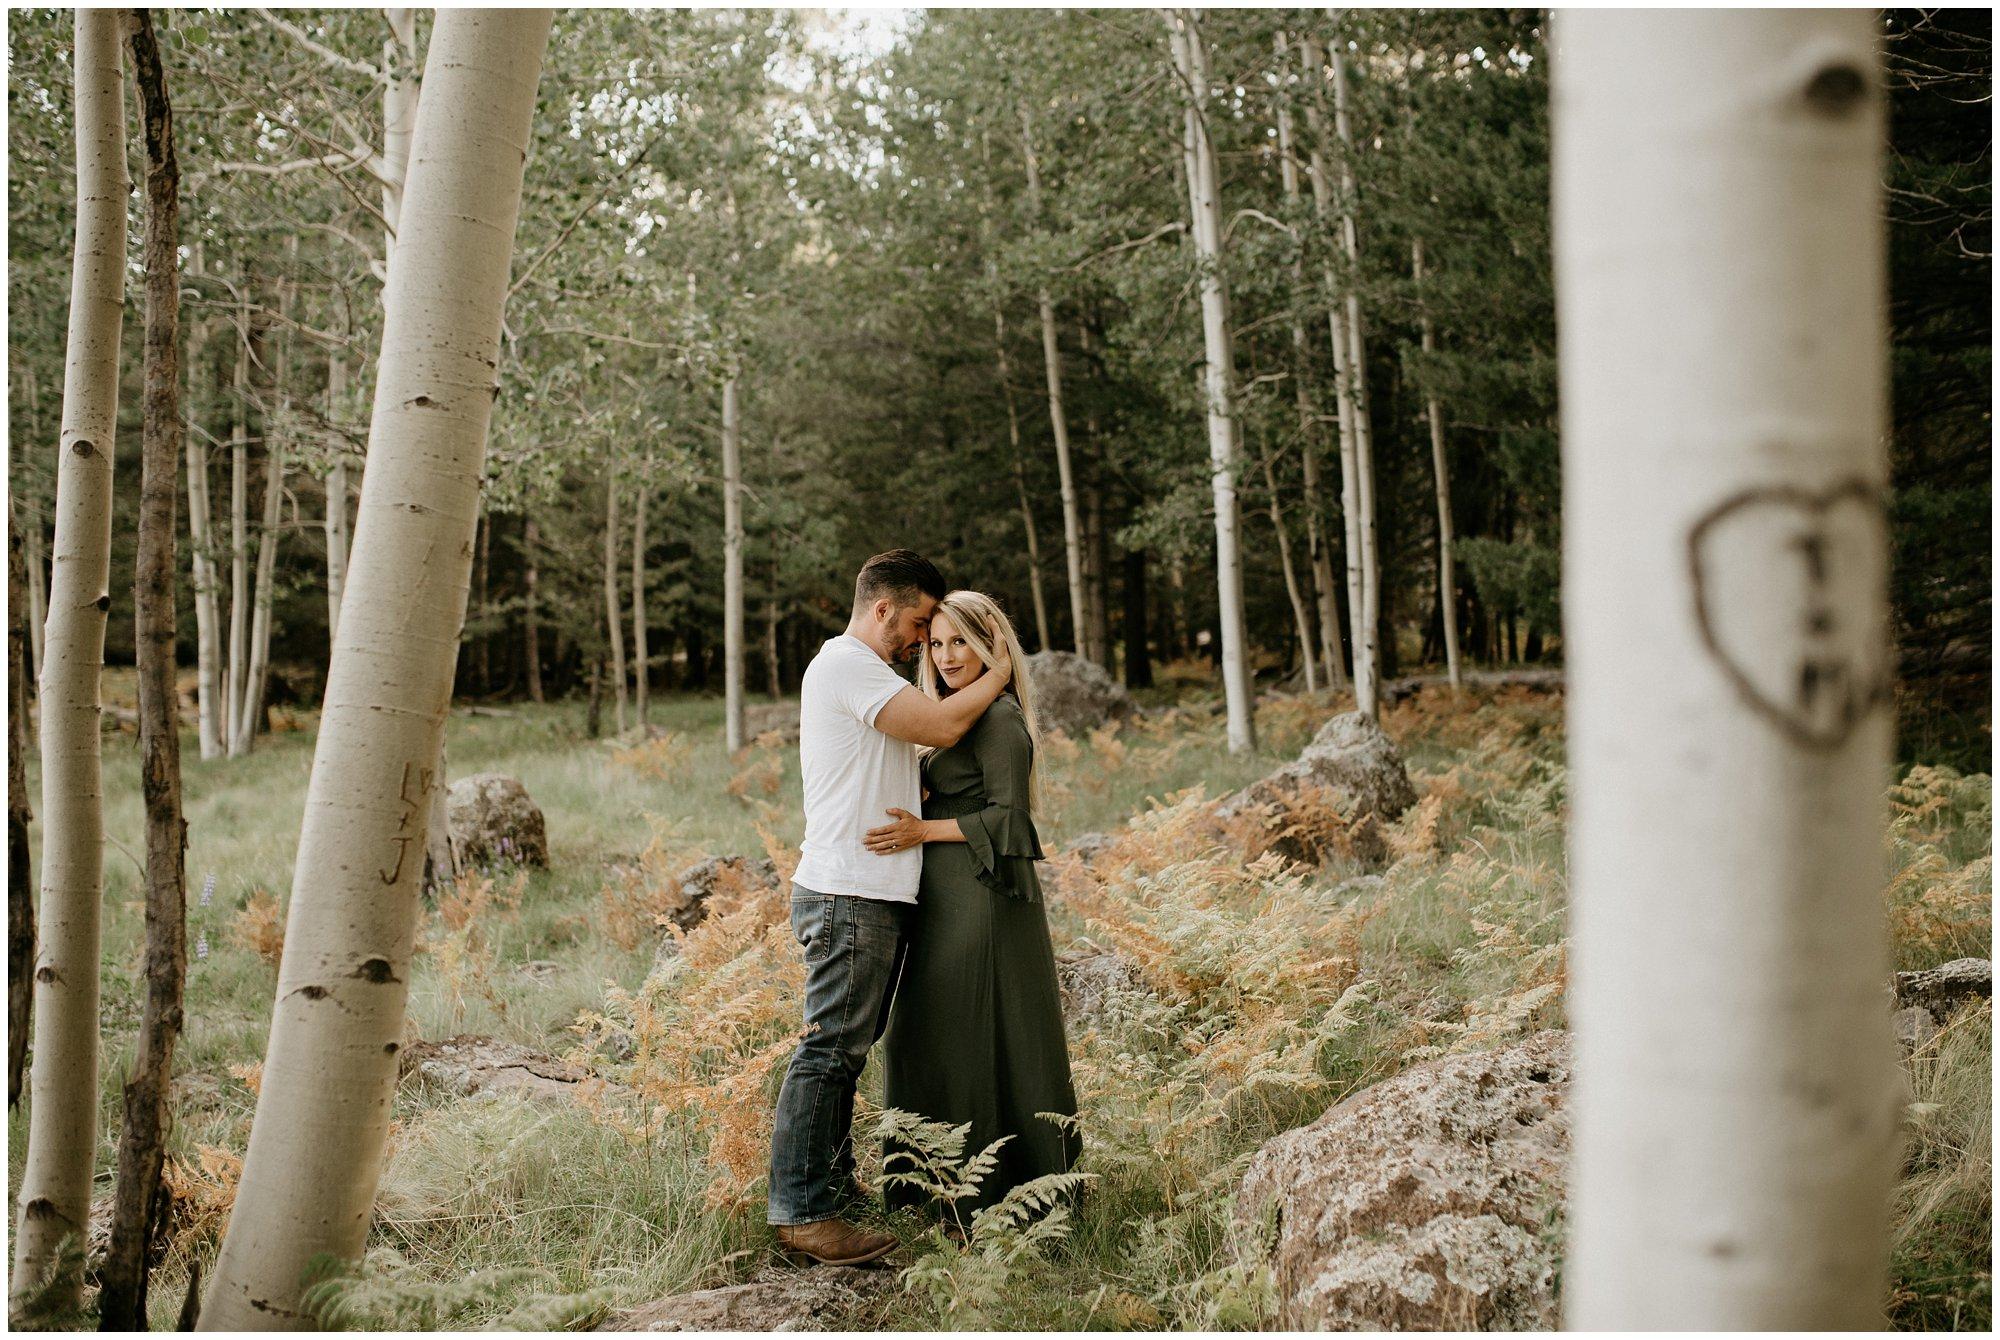 Flagstaff Aspen Tree Portrait Session - Gabby + Gary - Ashtyn Nicole Photo_0013.jpg